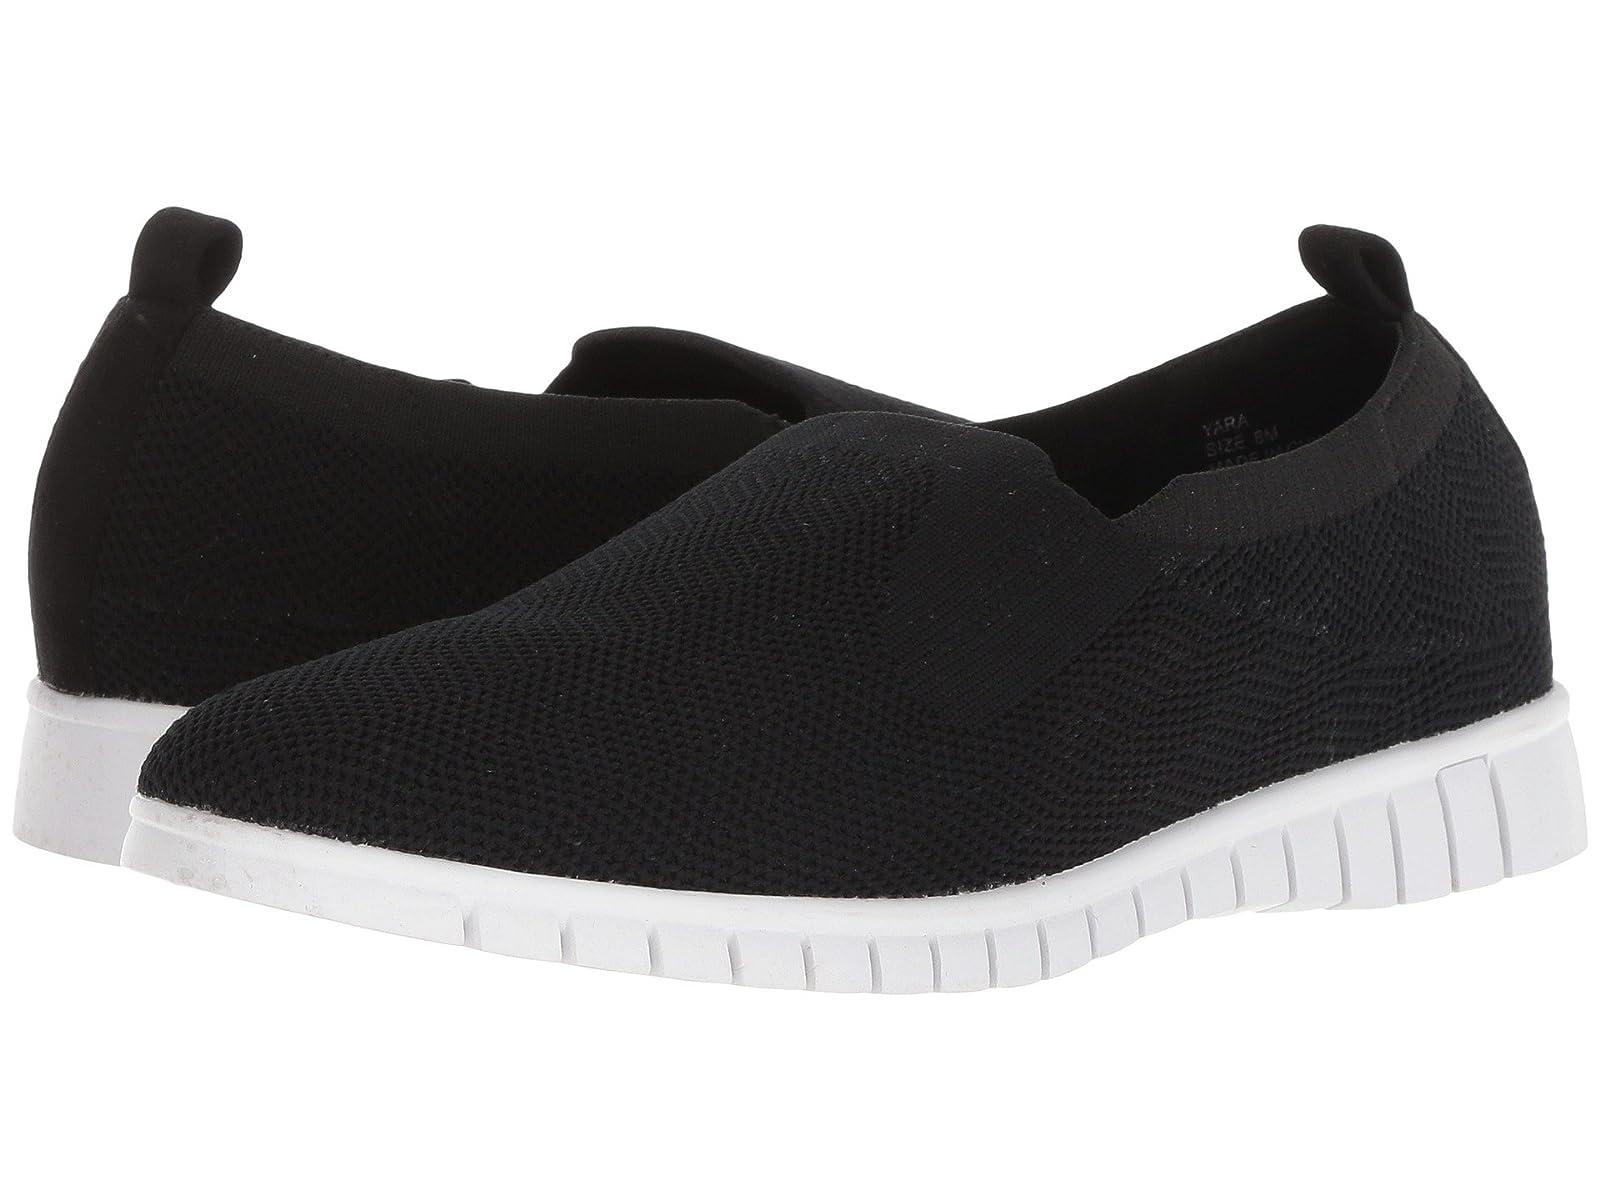 Matisse YaraAtmospheric grades have affordable shoes